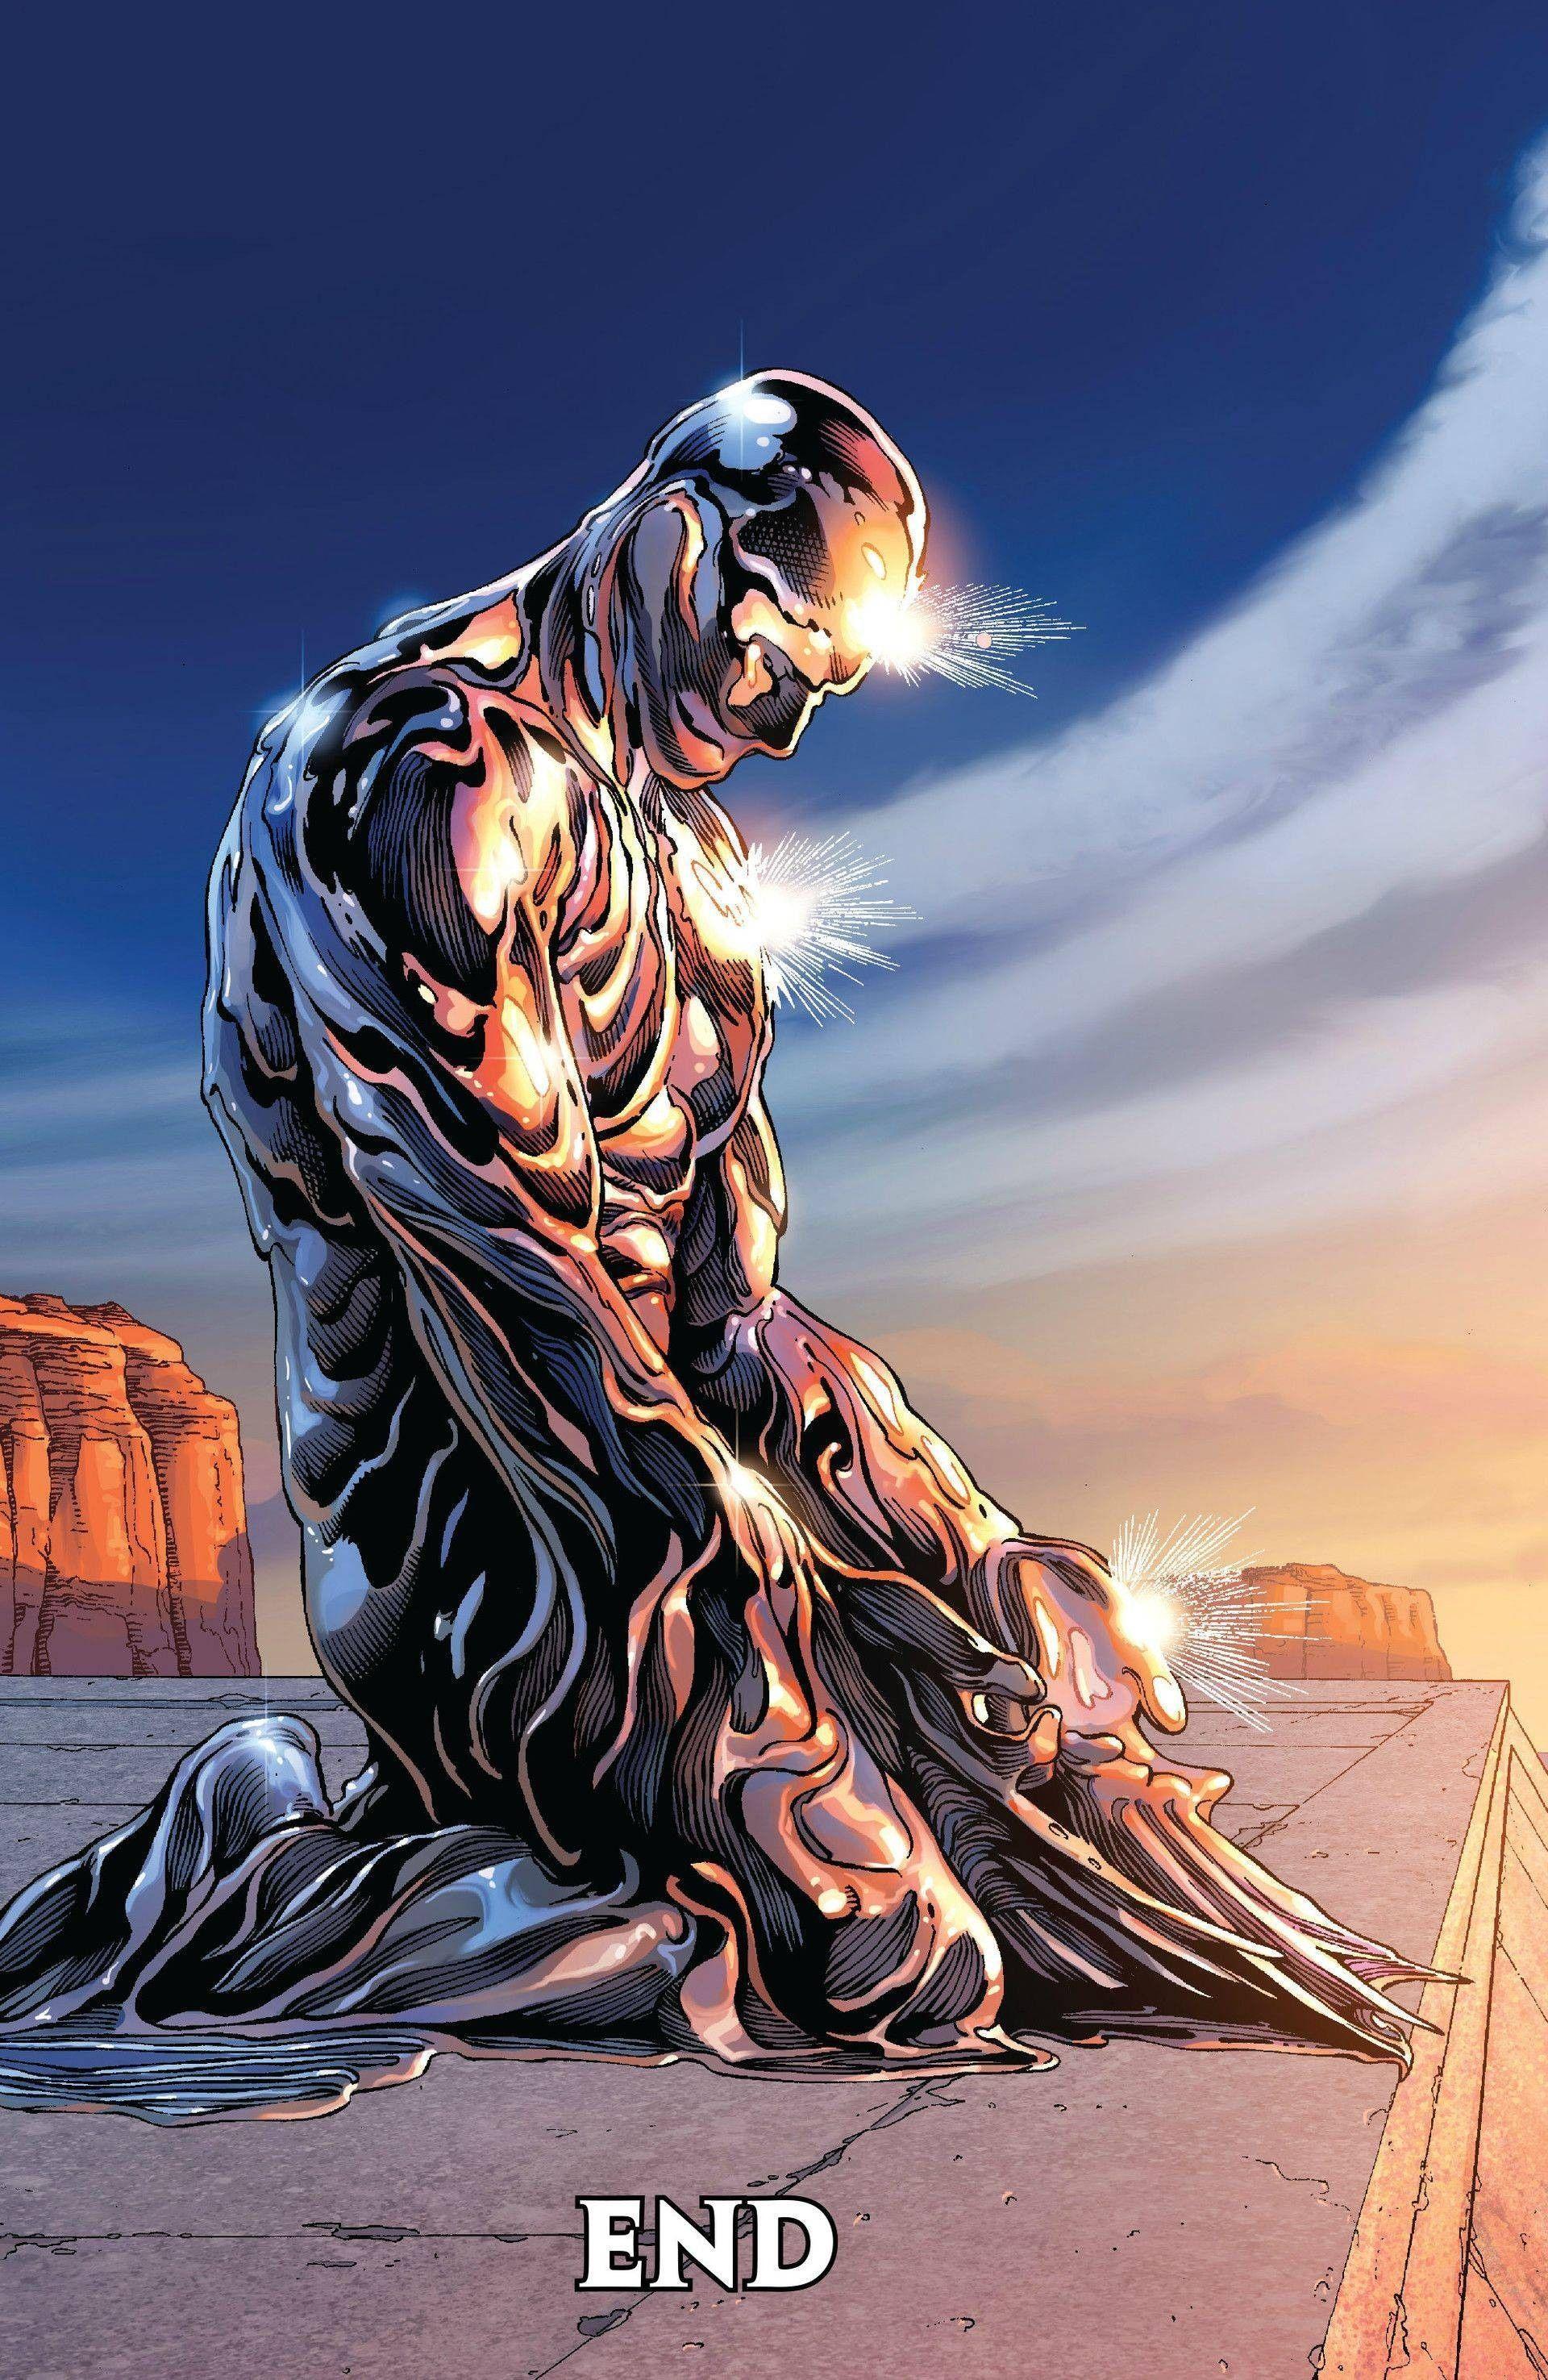 X Men Wolverine 2016 Wallpapers Wallpaper Cave